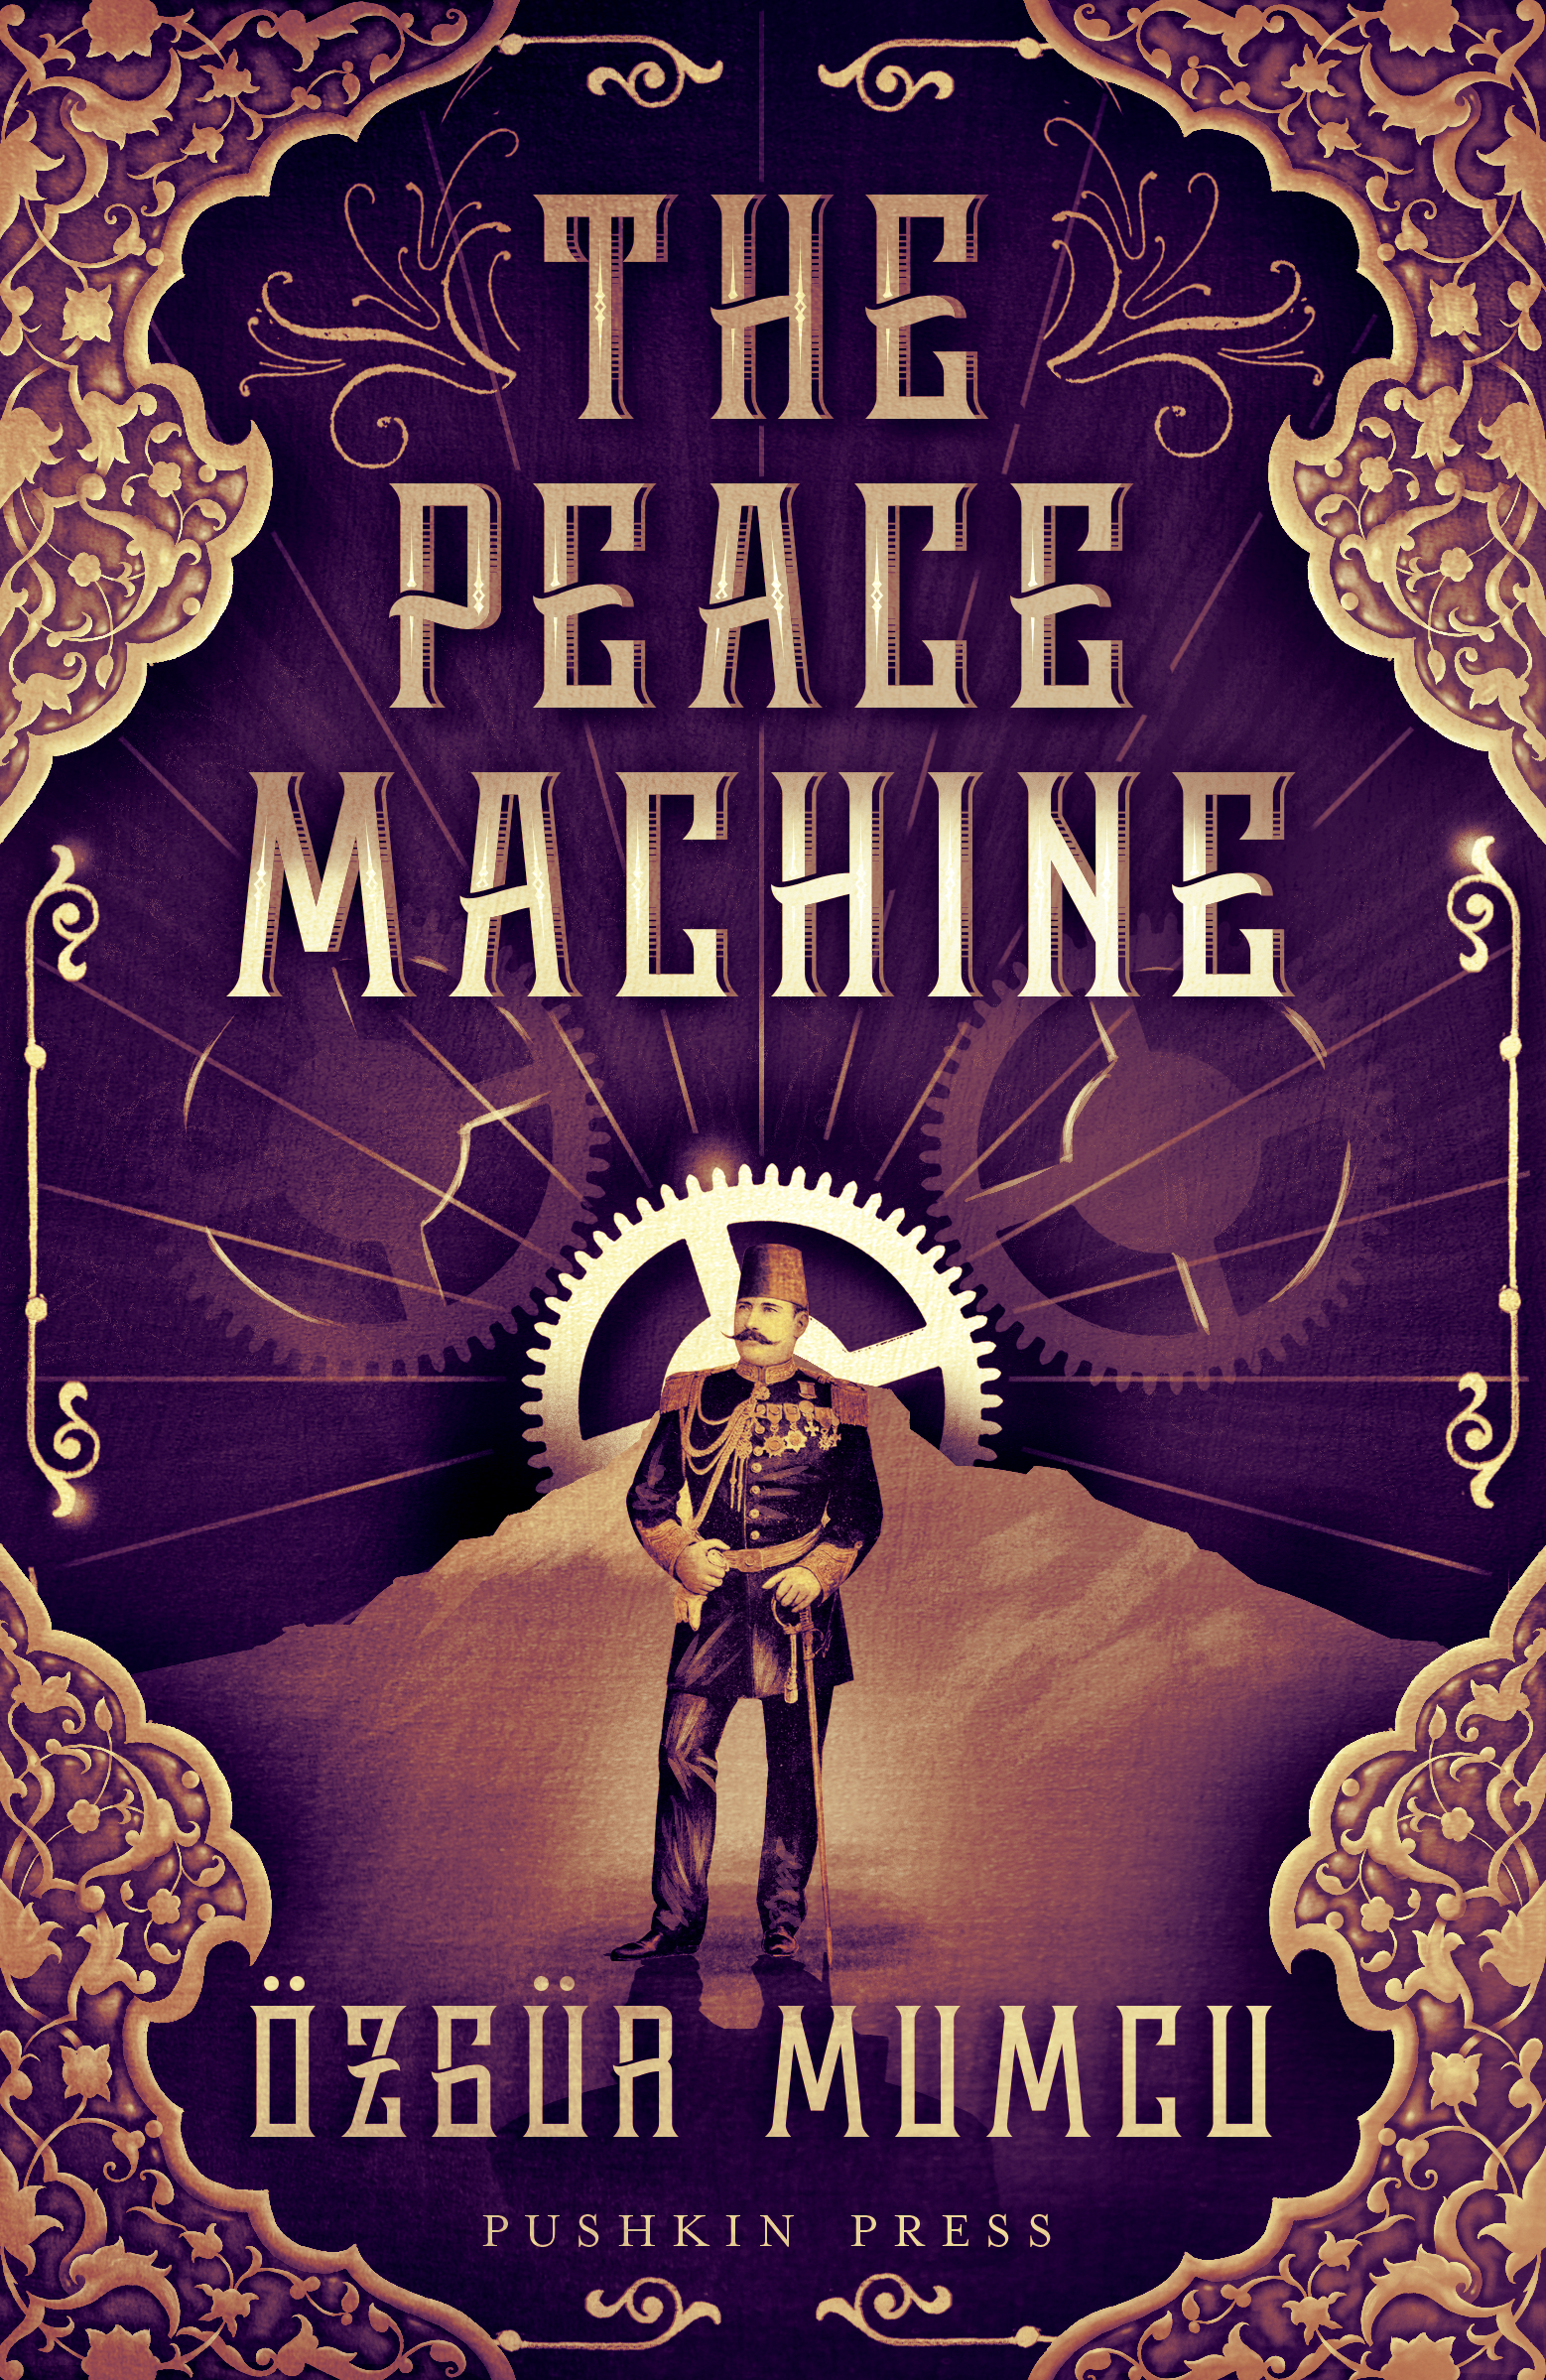 Peace machine_draft.jpg